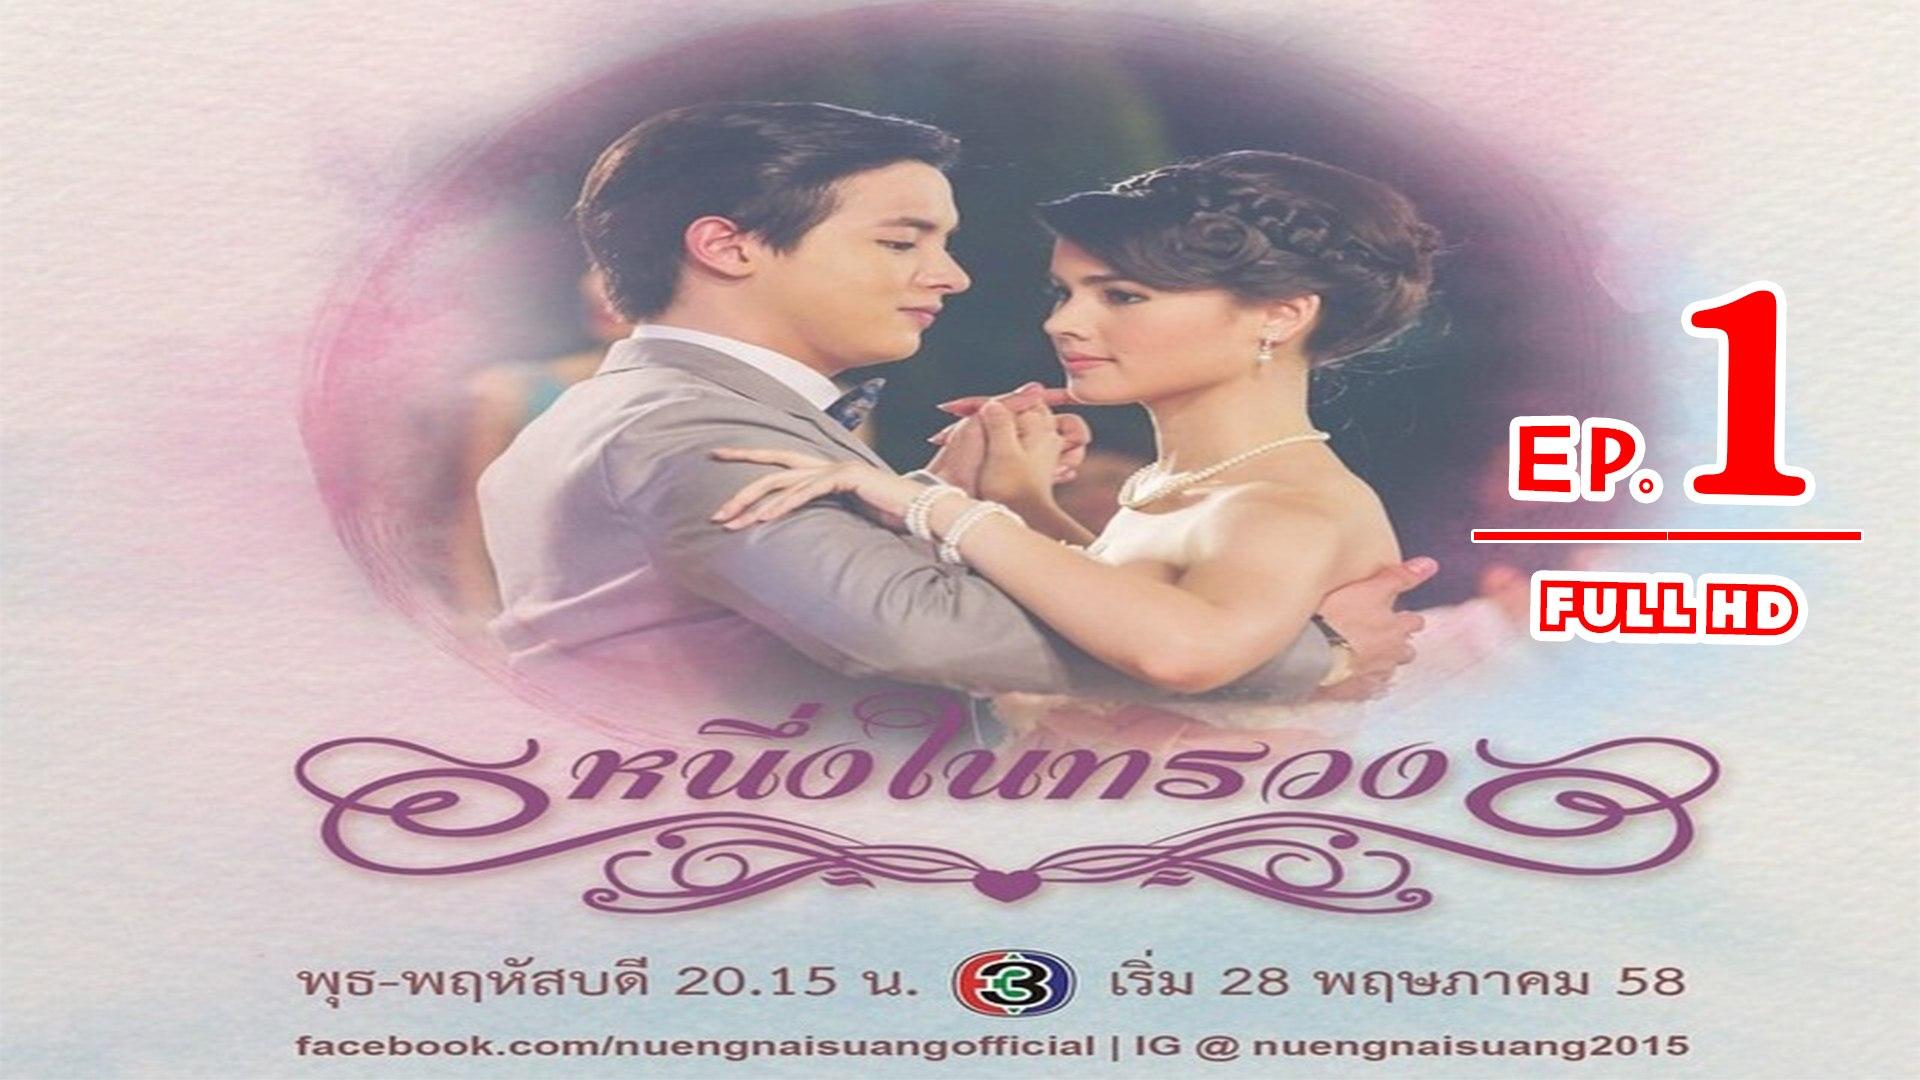 151472f7e6c0 [Eng Sub] Neung Nai Suang 2015 - THAI LAKORN EP.1B - video dailymotion